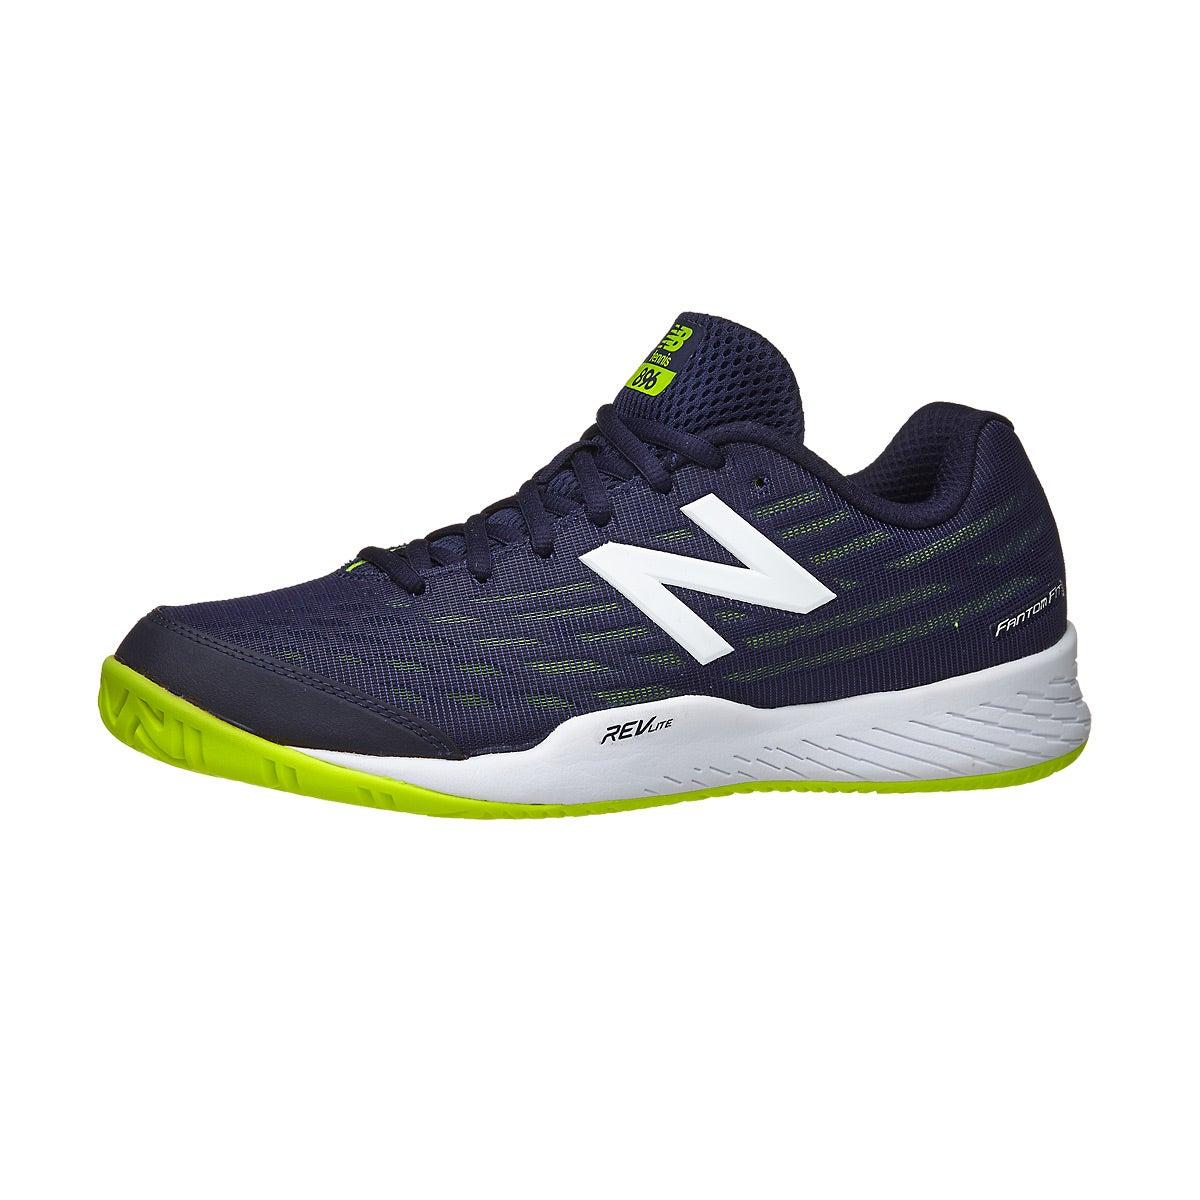 san francisco e4ec5 04672 ... inexpensive new balance mc 896v2 2e navy black green mens shoes 360  view. 50d13 1ae00